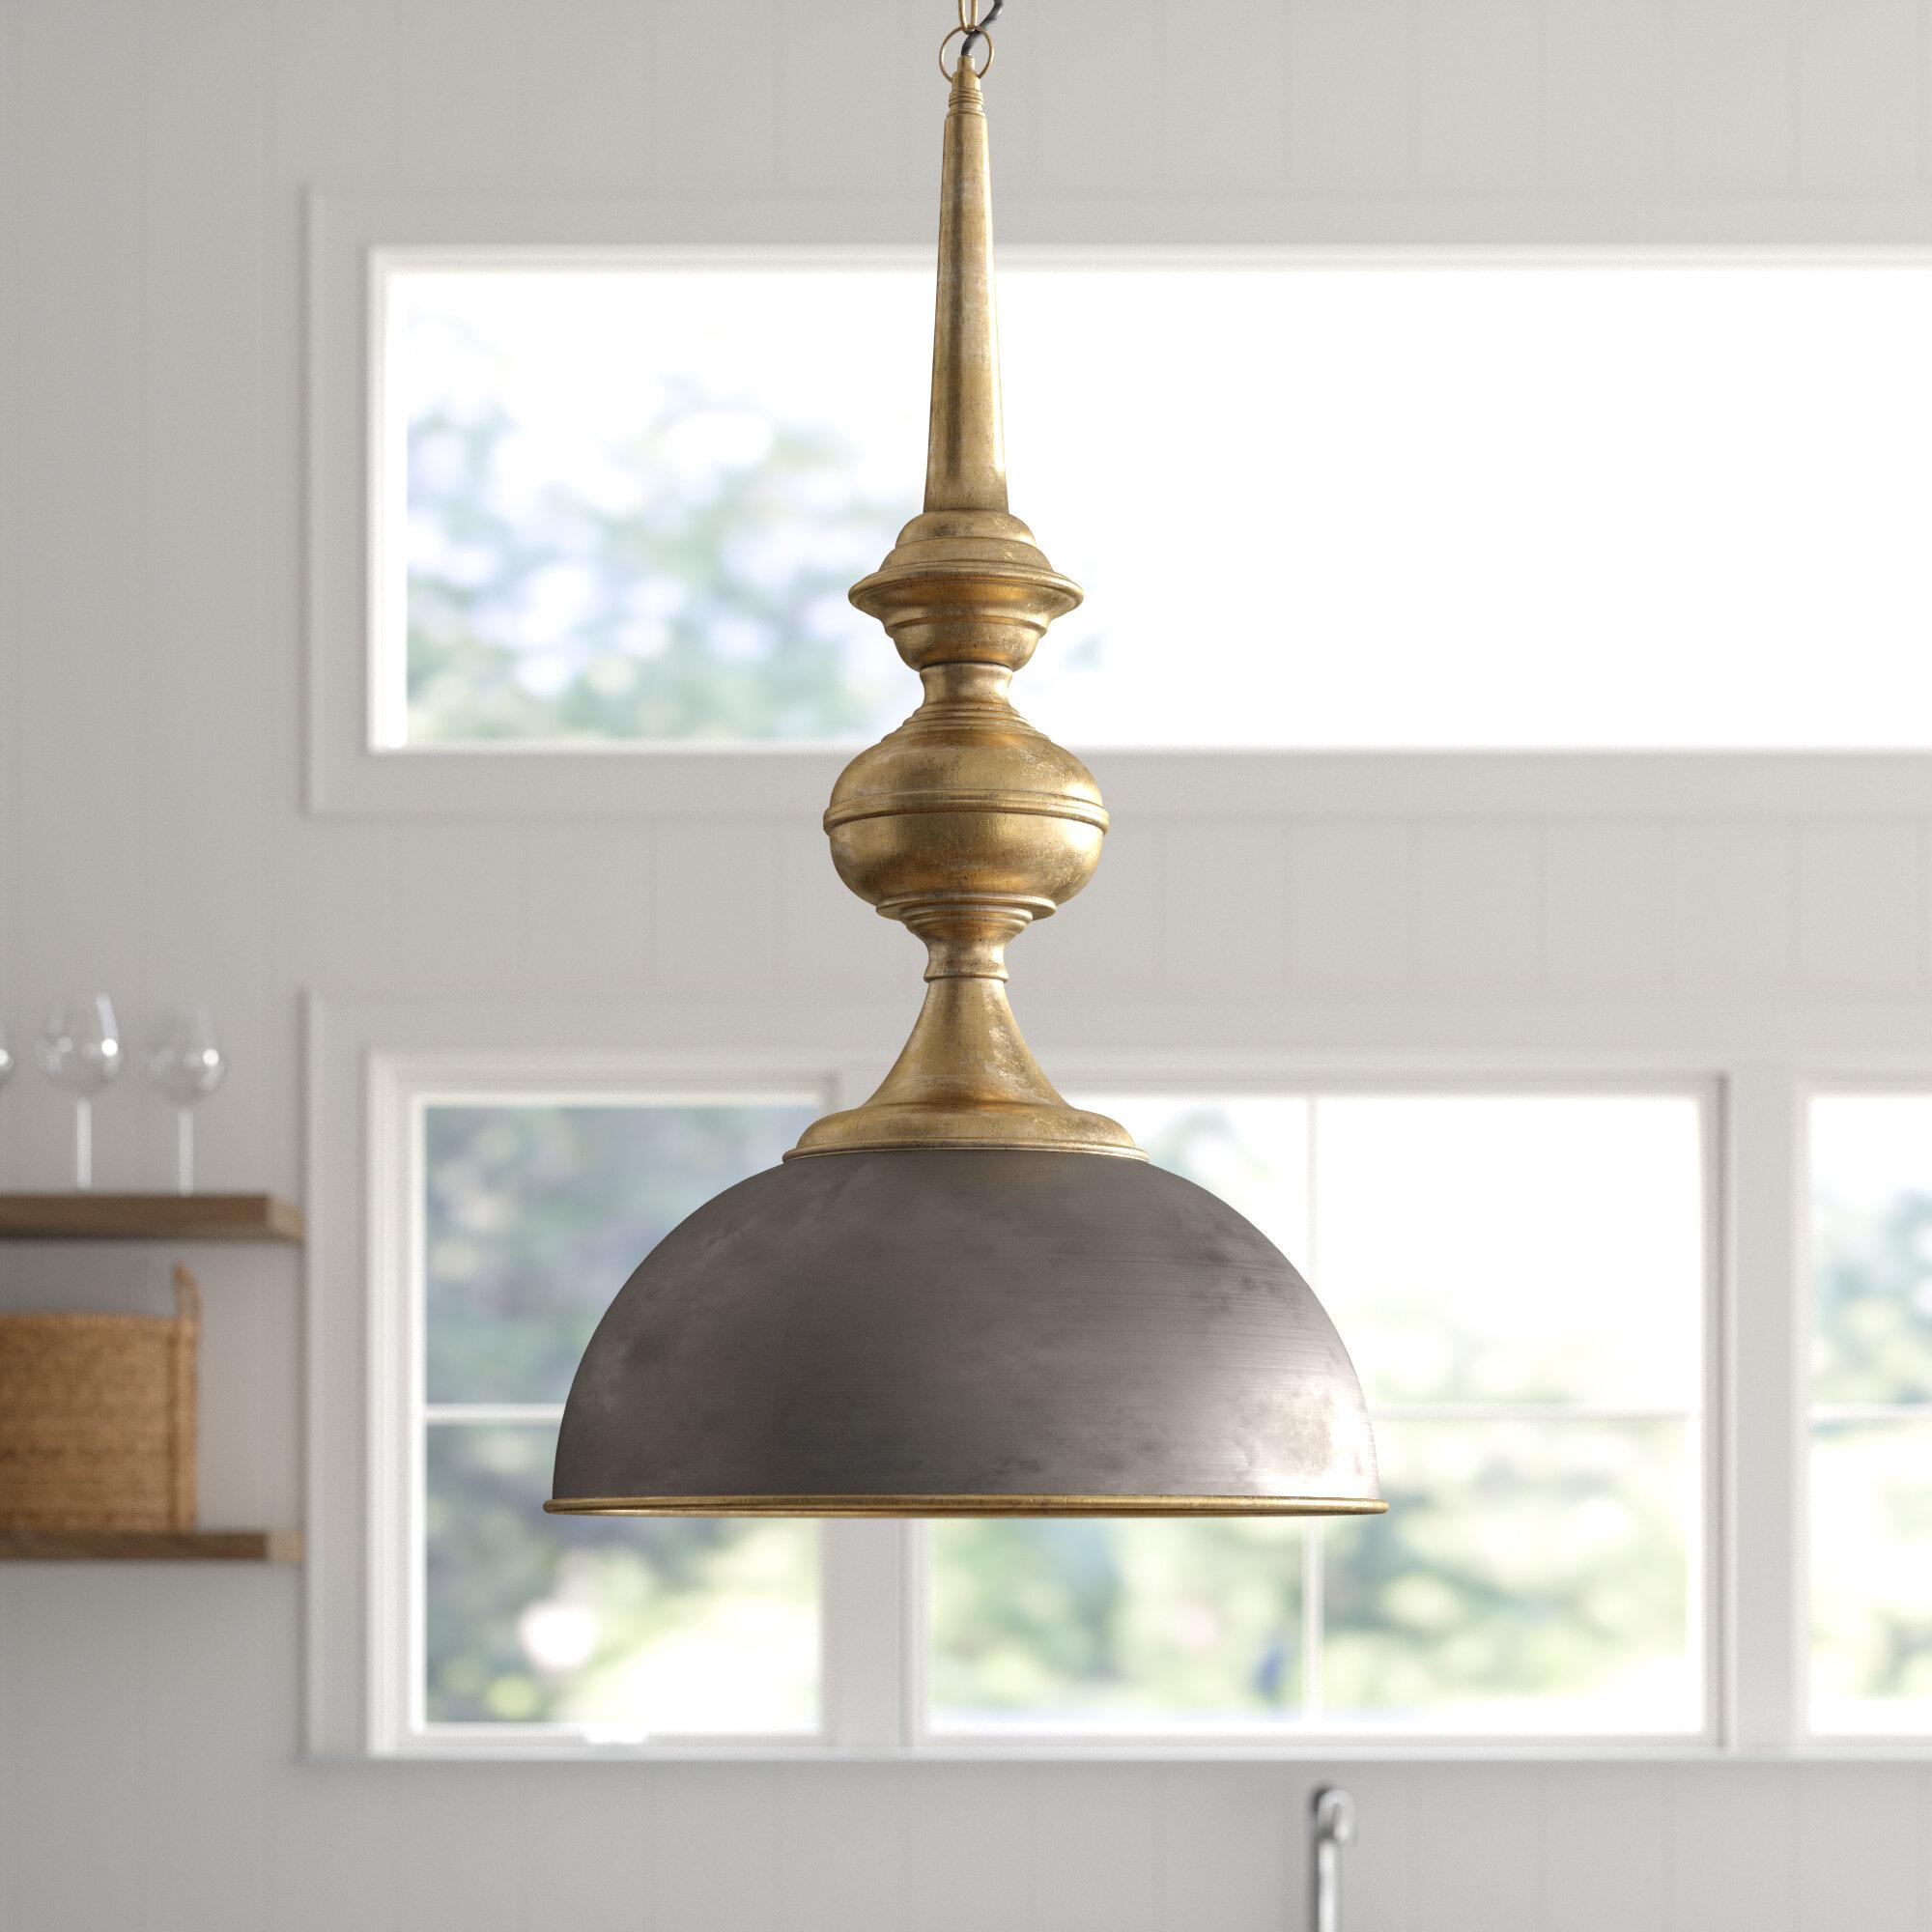 Corrine 1 Light Single Dome Pendant Regarding Grullon Scroll 1 Light Single Bell Pendants (View 4 of 30)